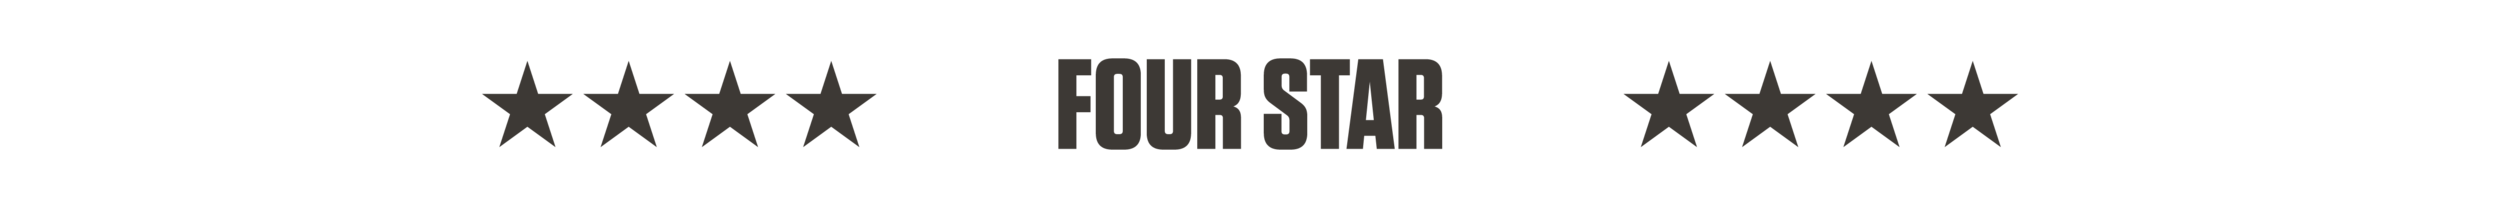 Sponsor Stars_Four Star.png